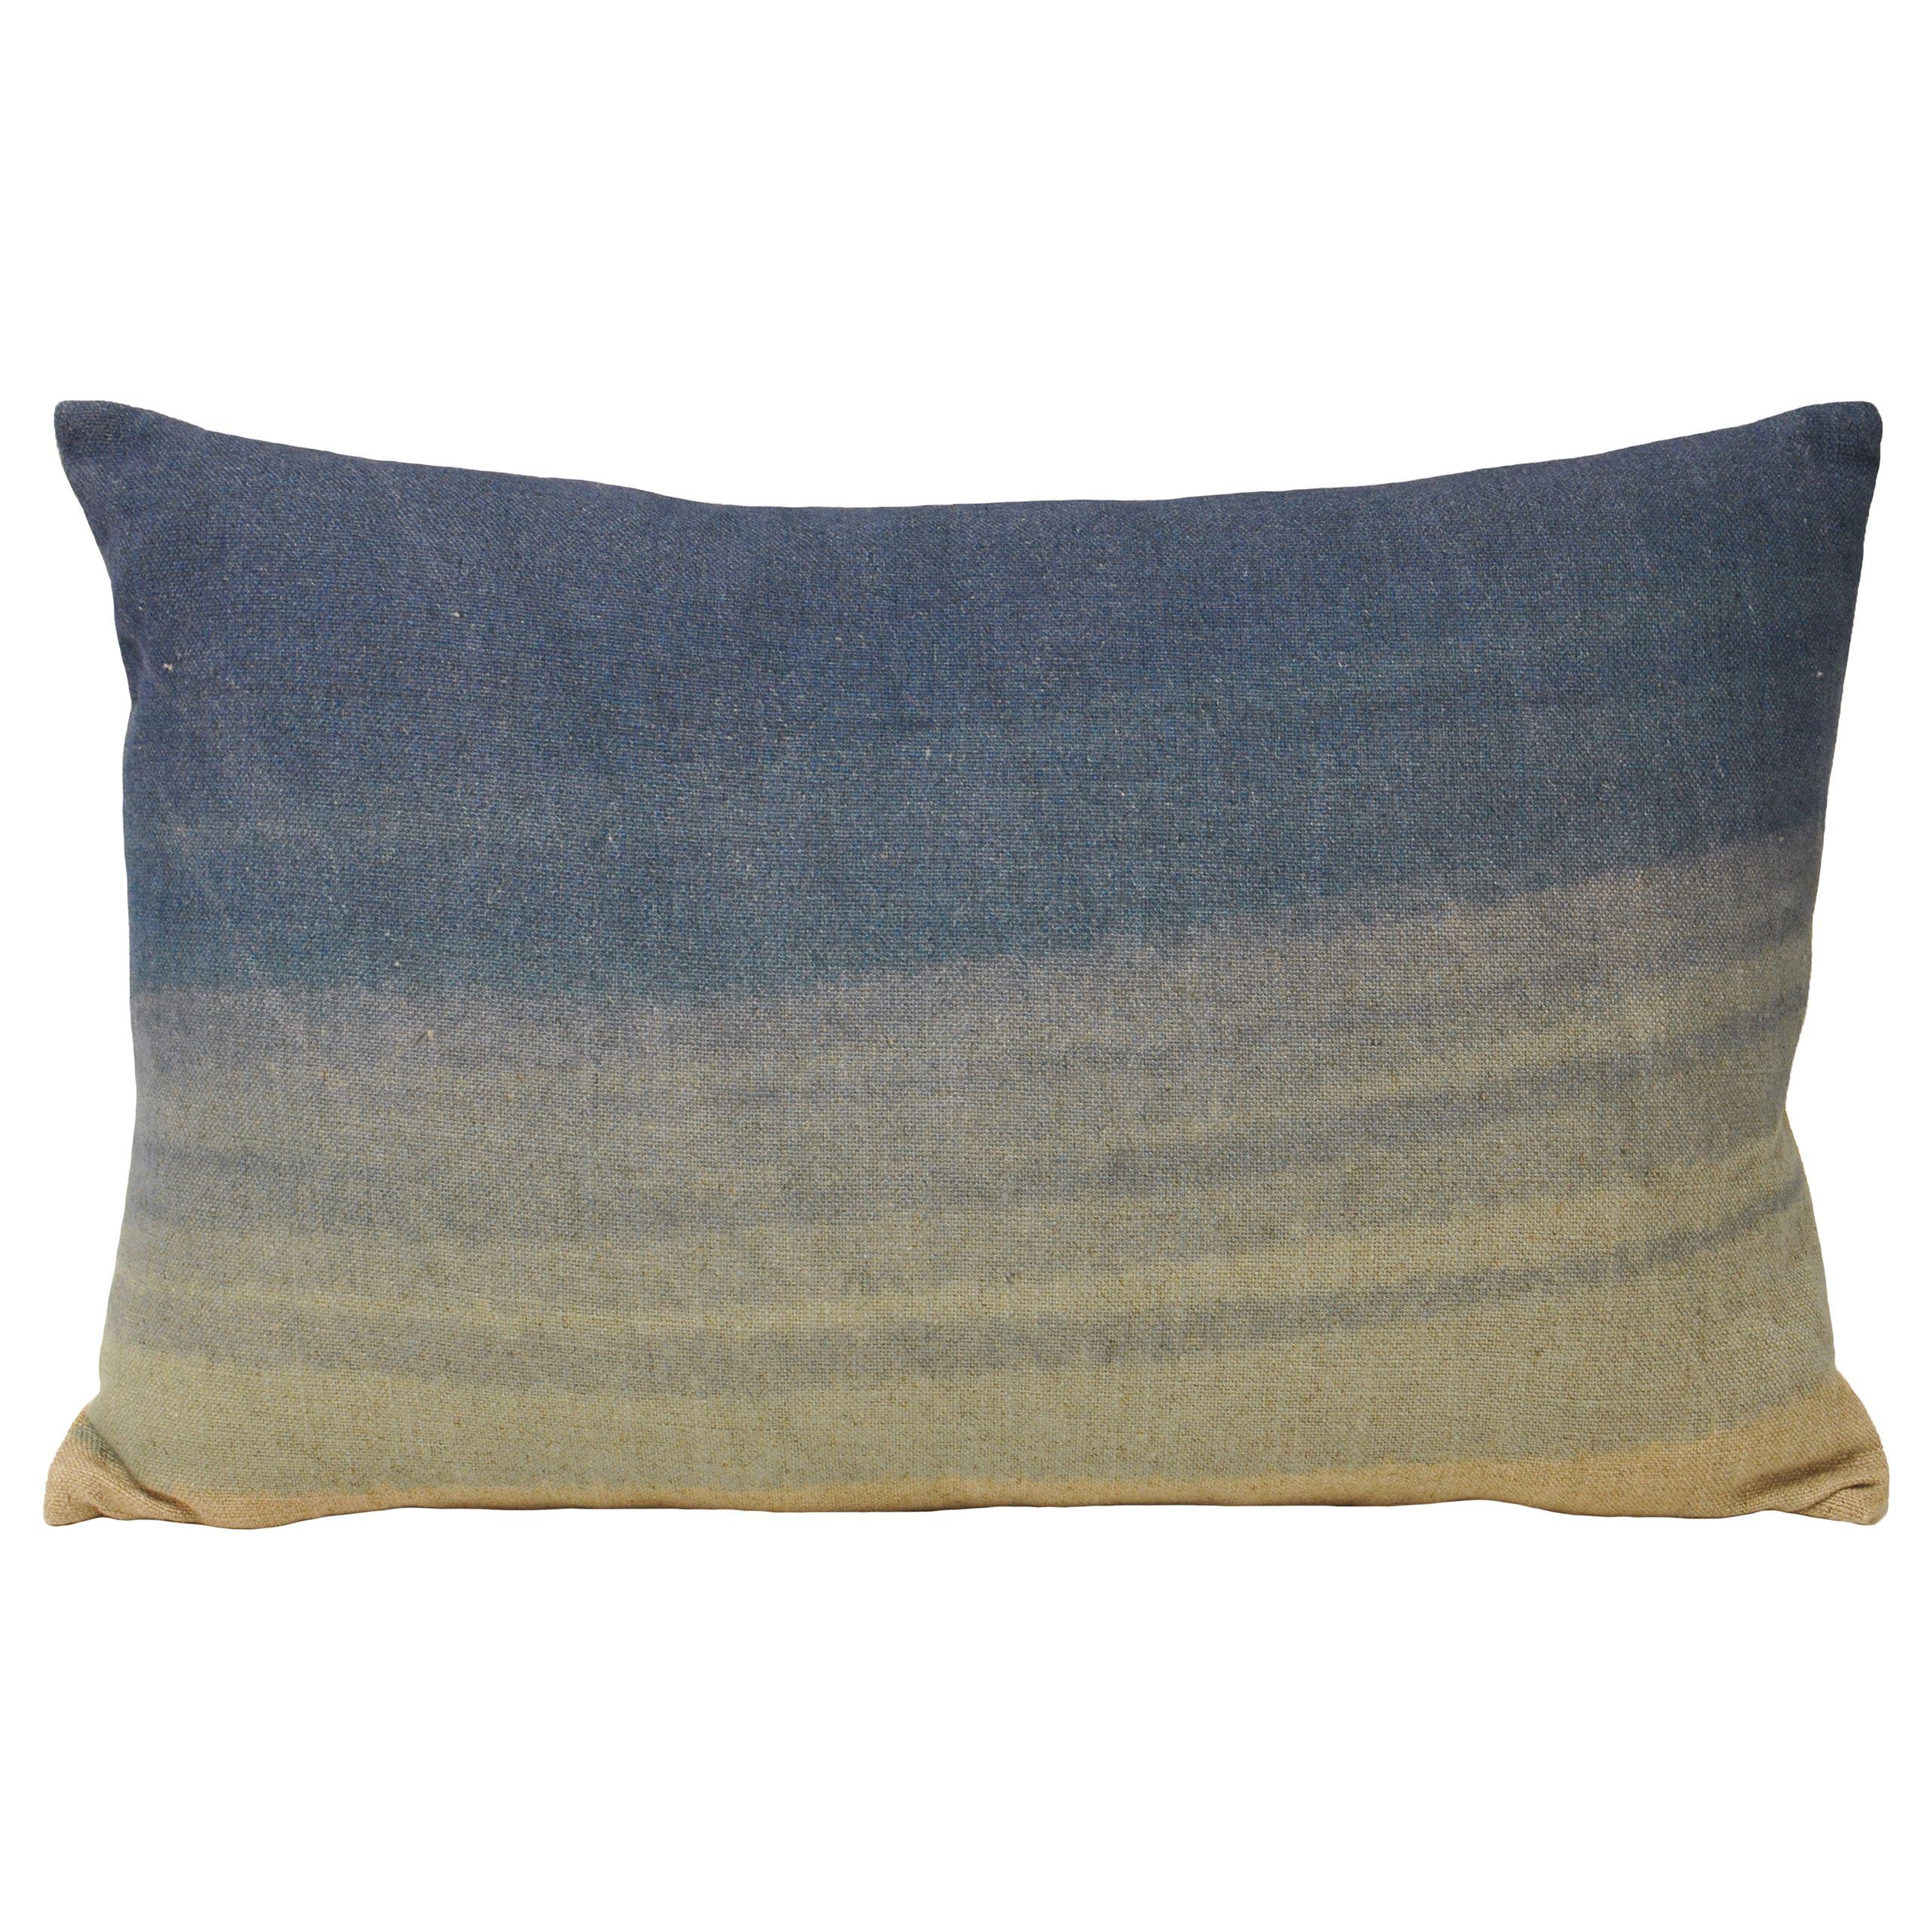 Seashore Polyester Filled Cushion